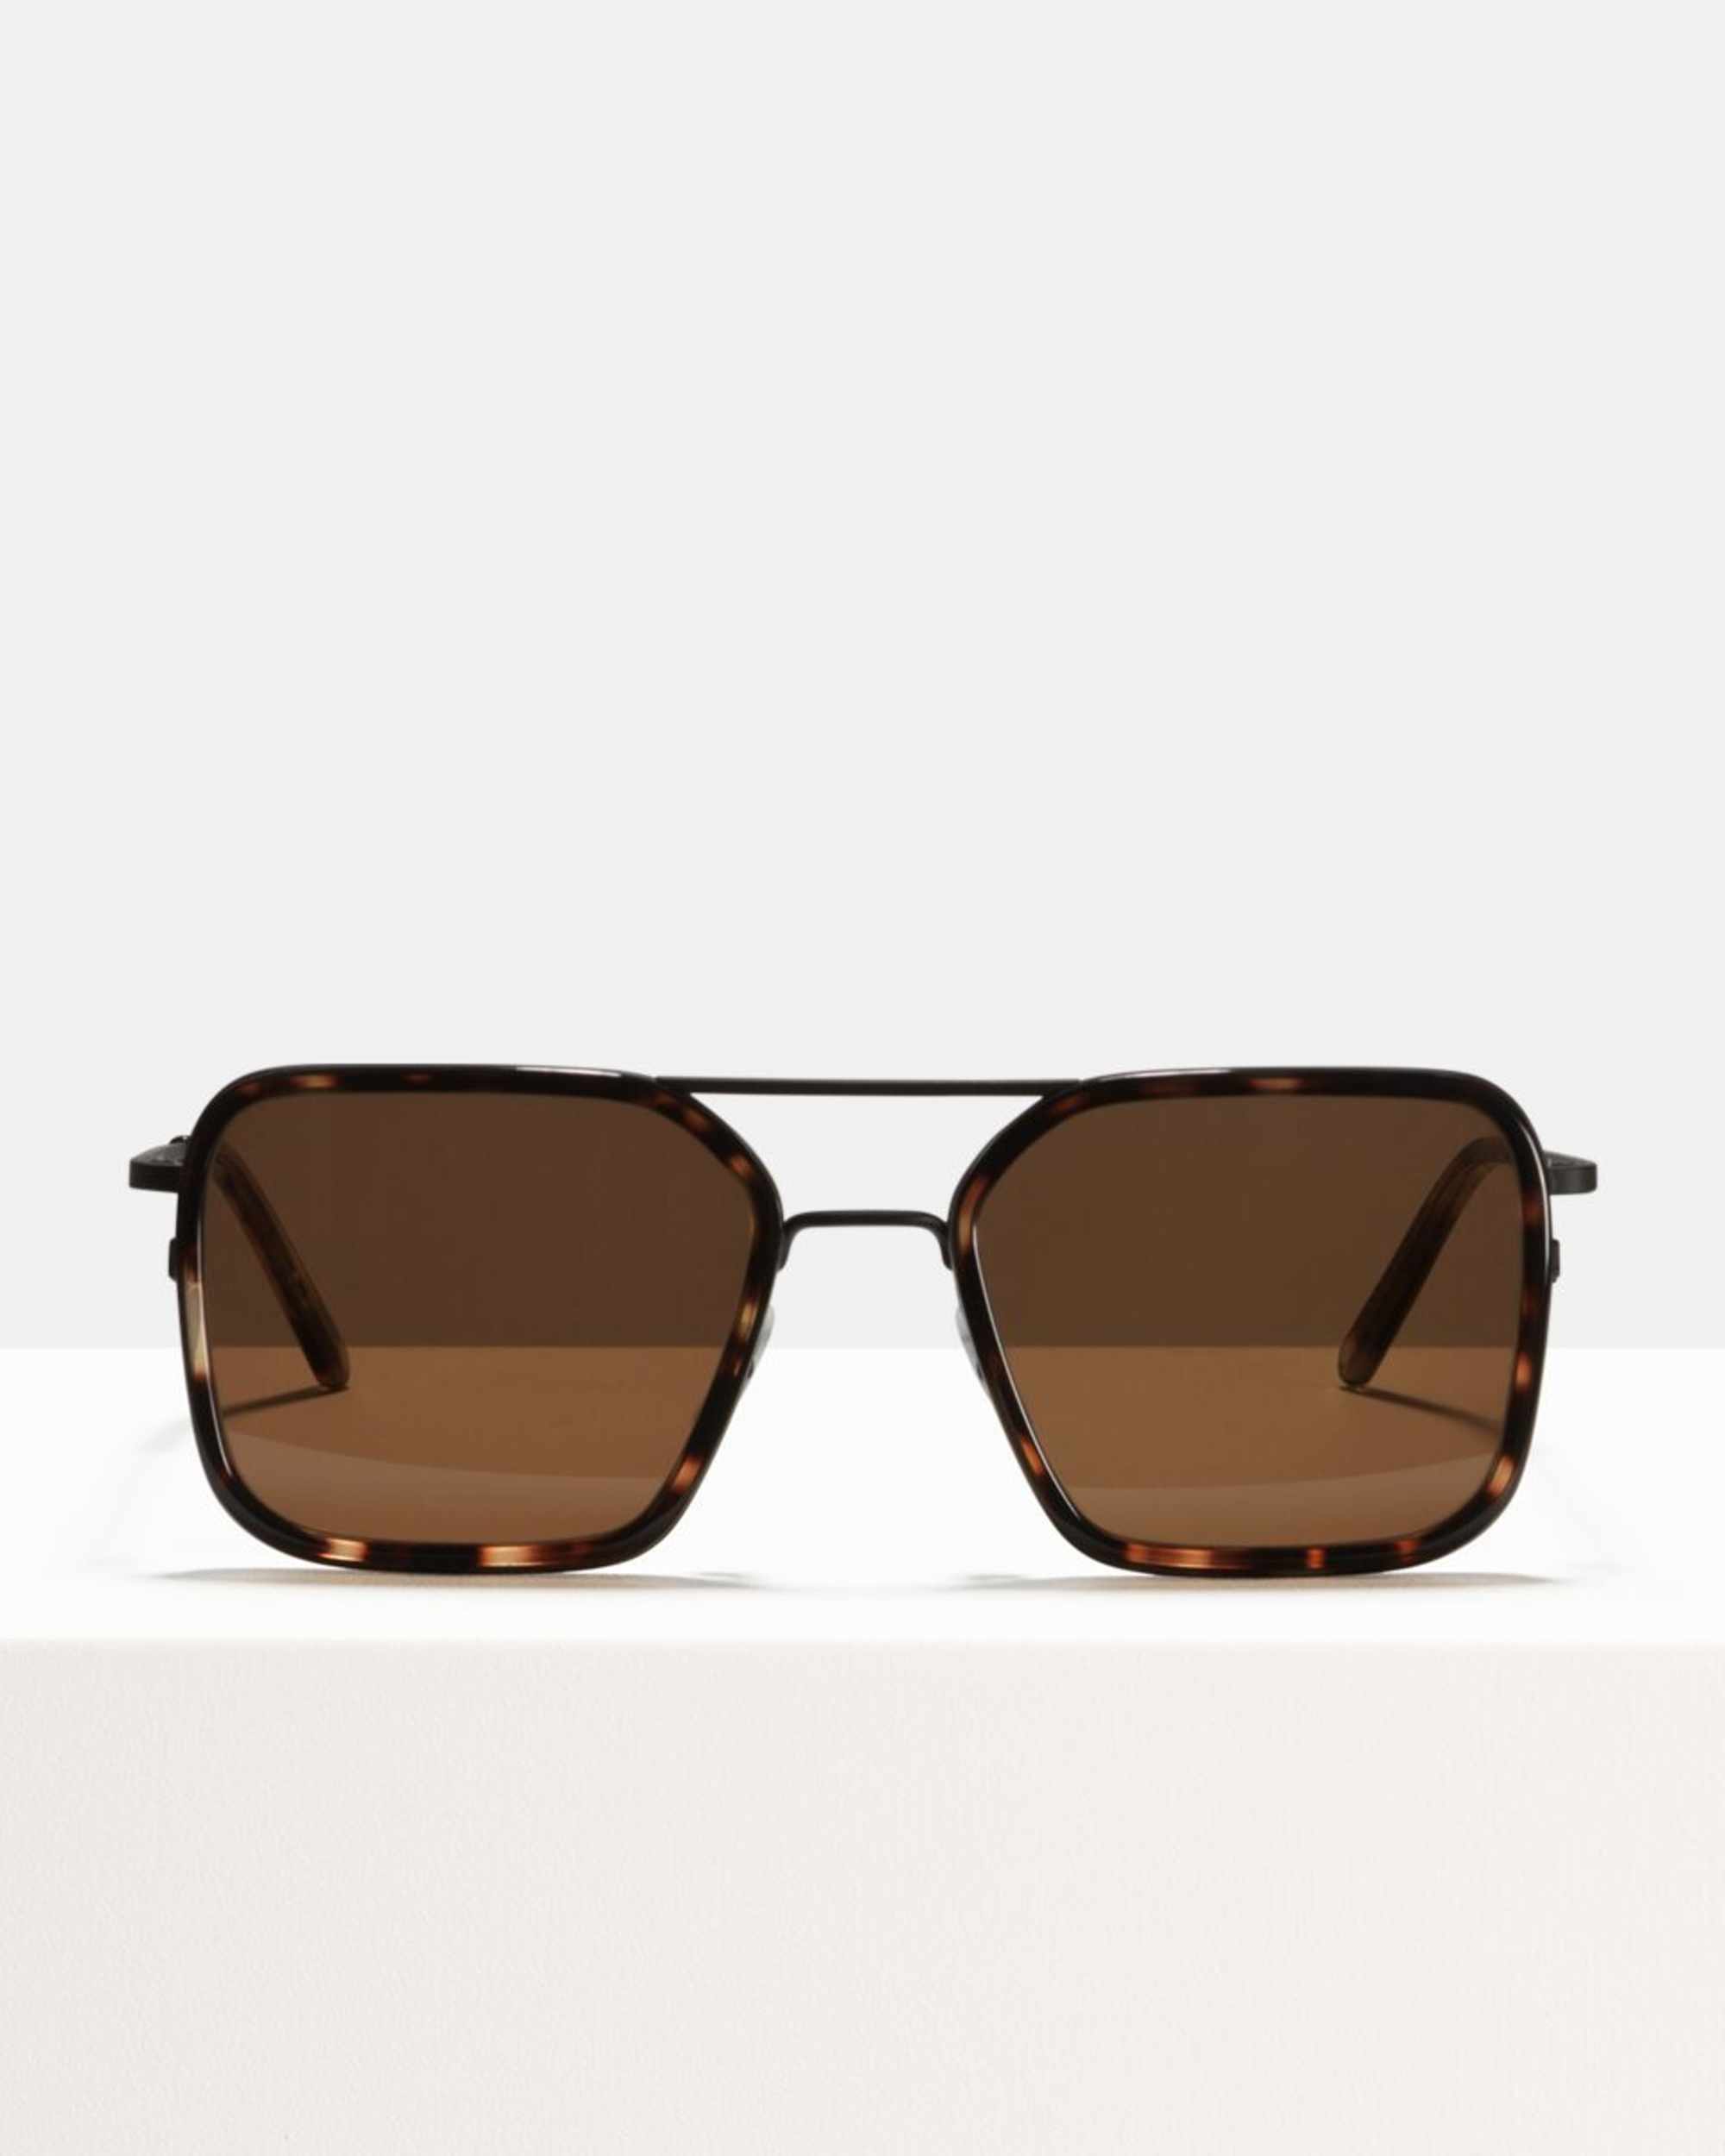 Ace & Tate Sunglasses | square combi in Black, Brown